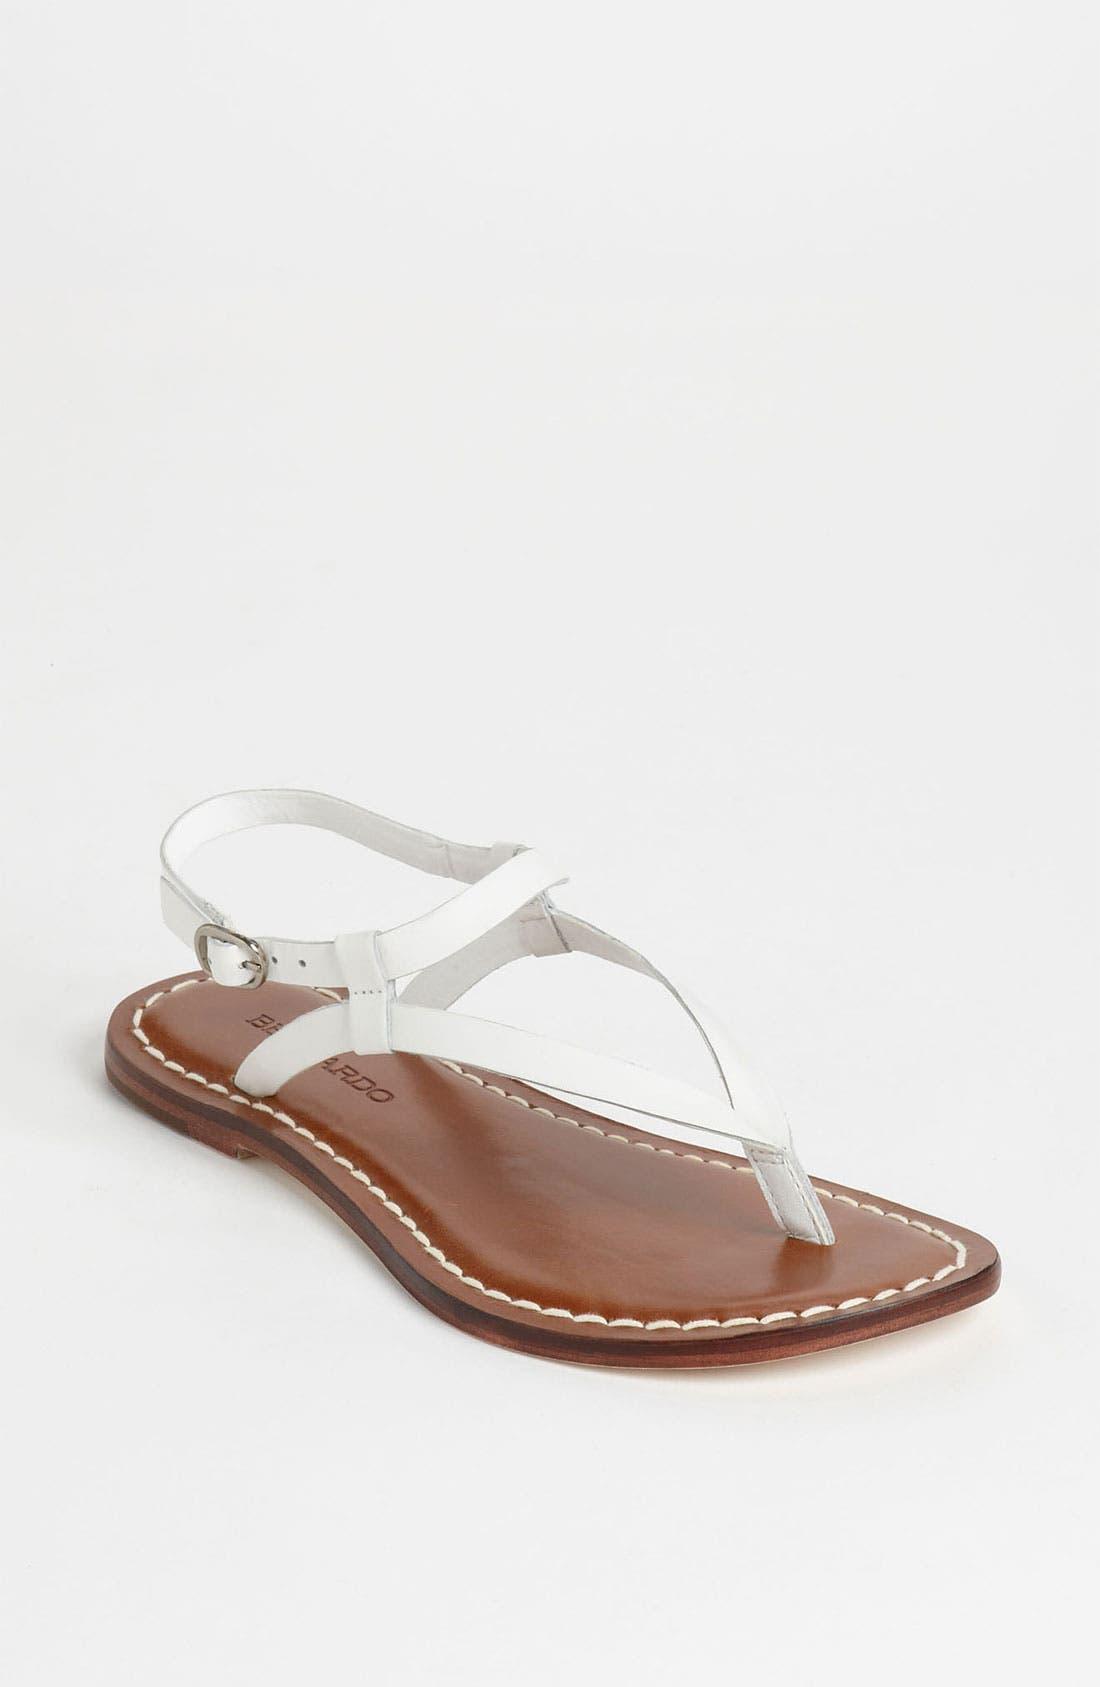 Alternate Image 1 Selected - Bernardo Footwear Merit Sandal